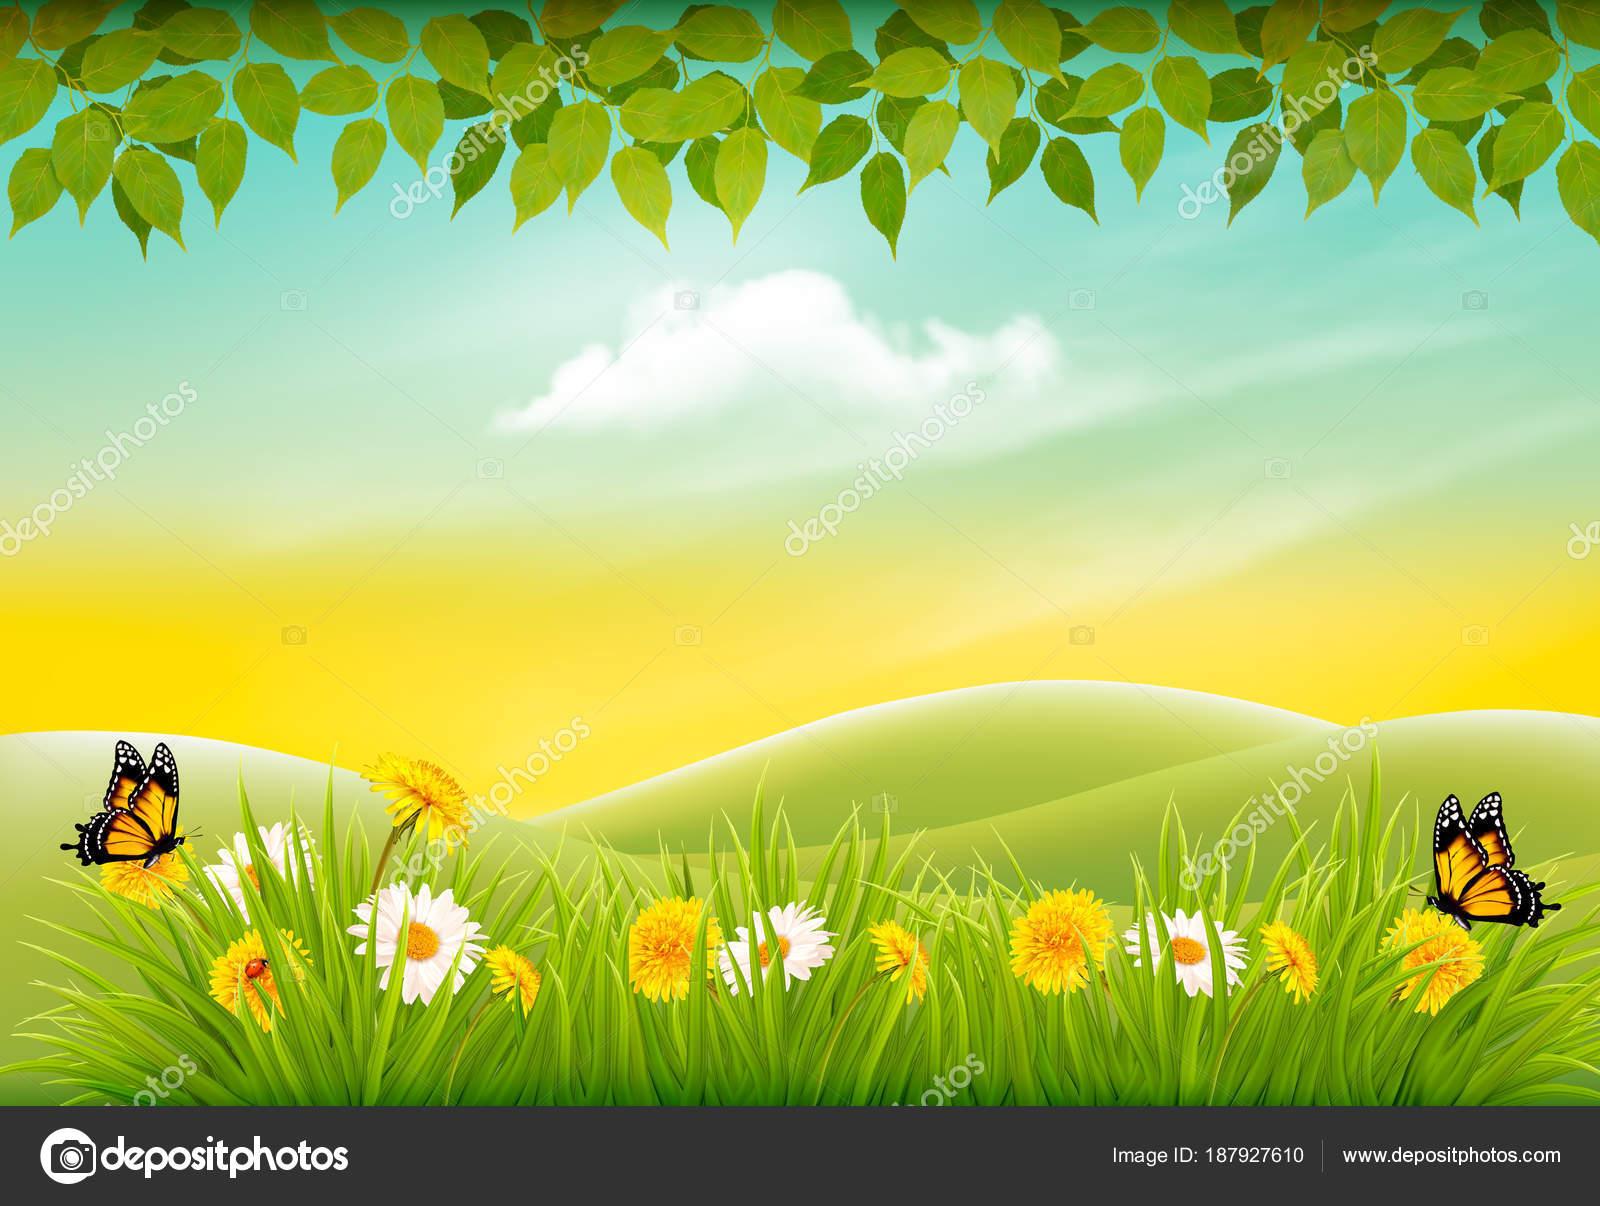 Imagenes De Paisajes De Primavera: Paisajes De Primavera Para Fondo